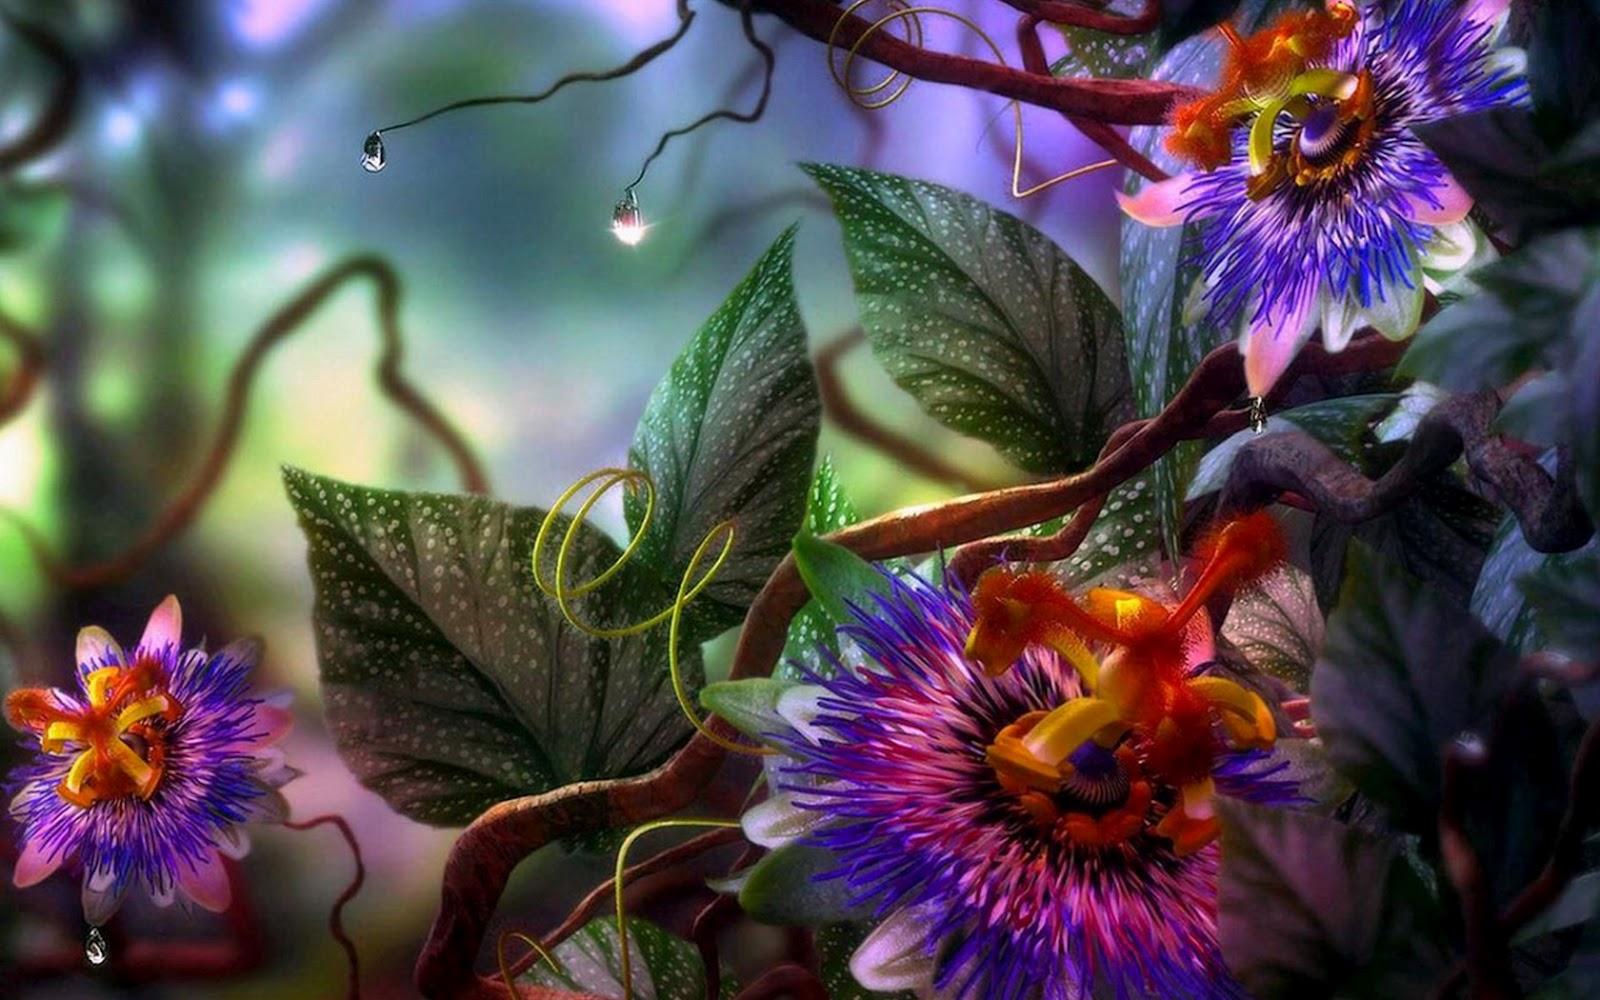 Imagenes Flores Exoticas Gratis - fondos de pantalla de flores exoticas Mymadrid me